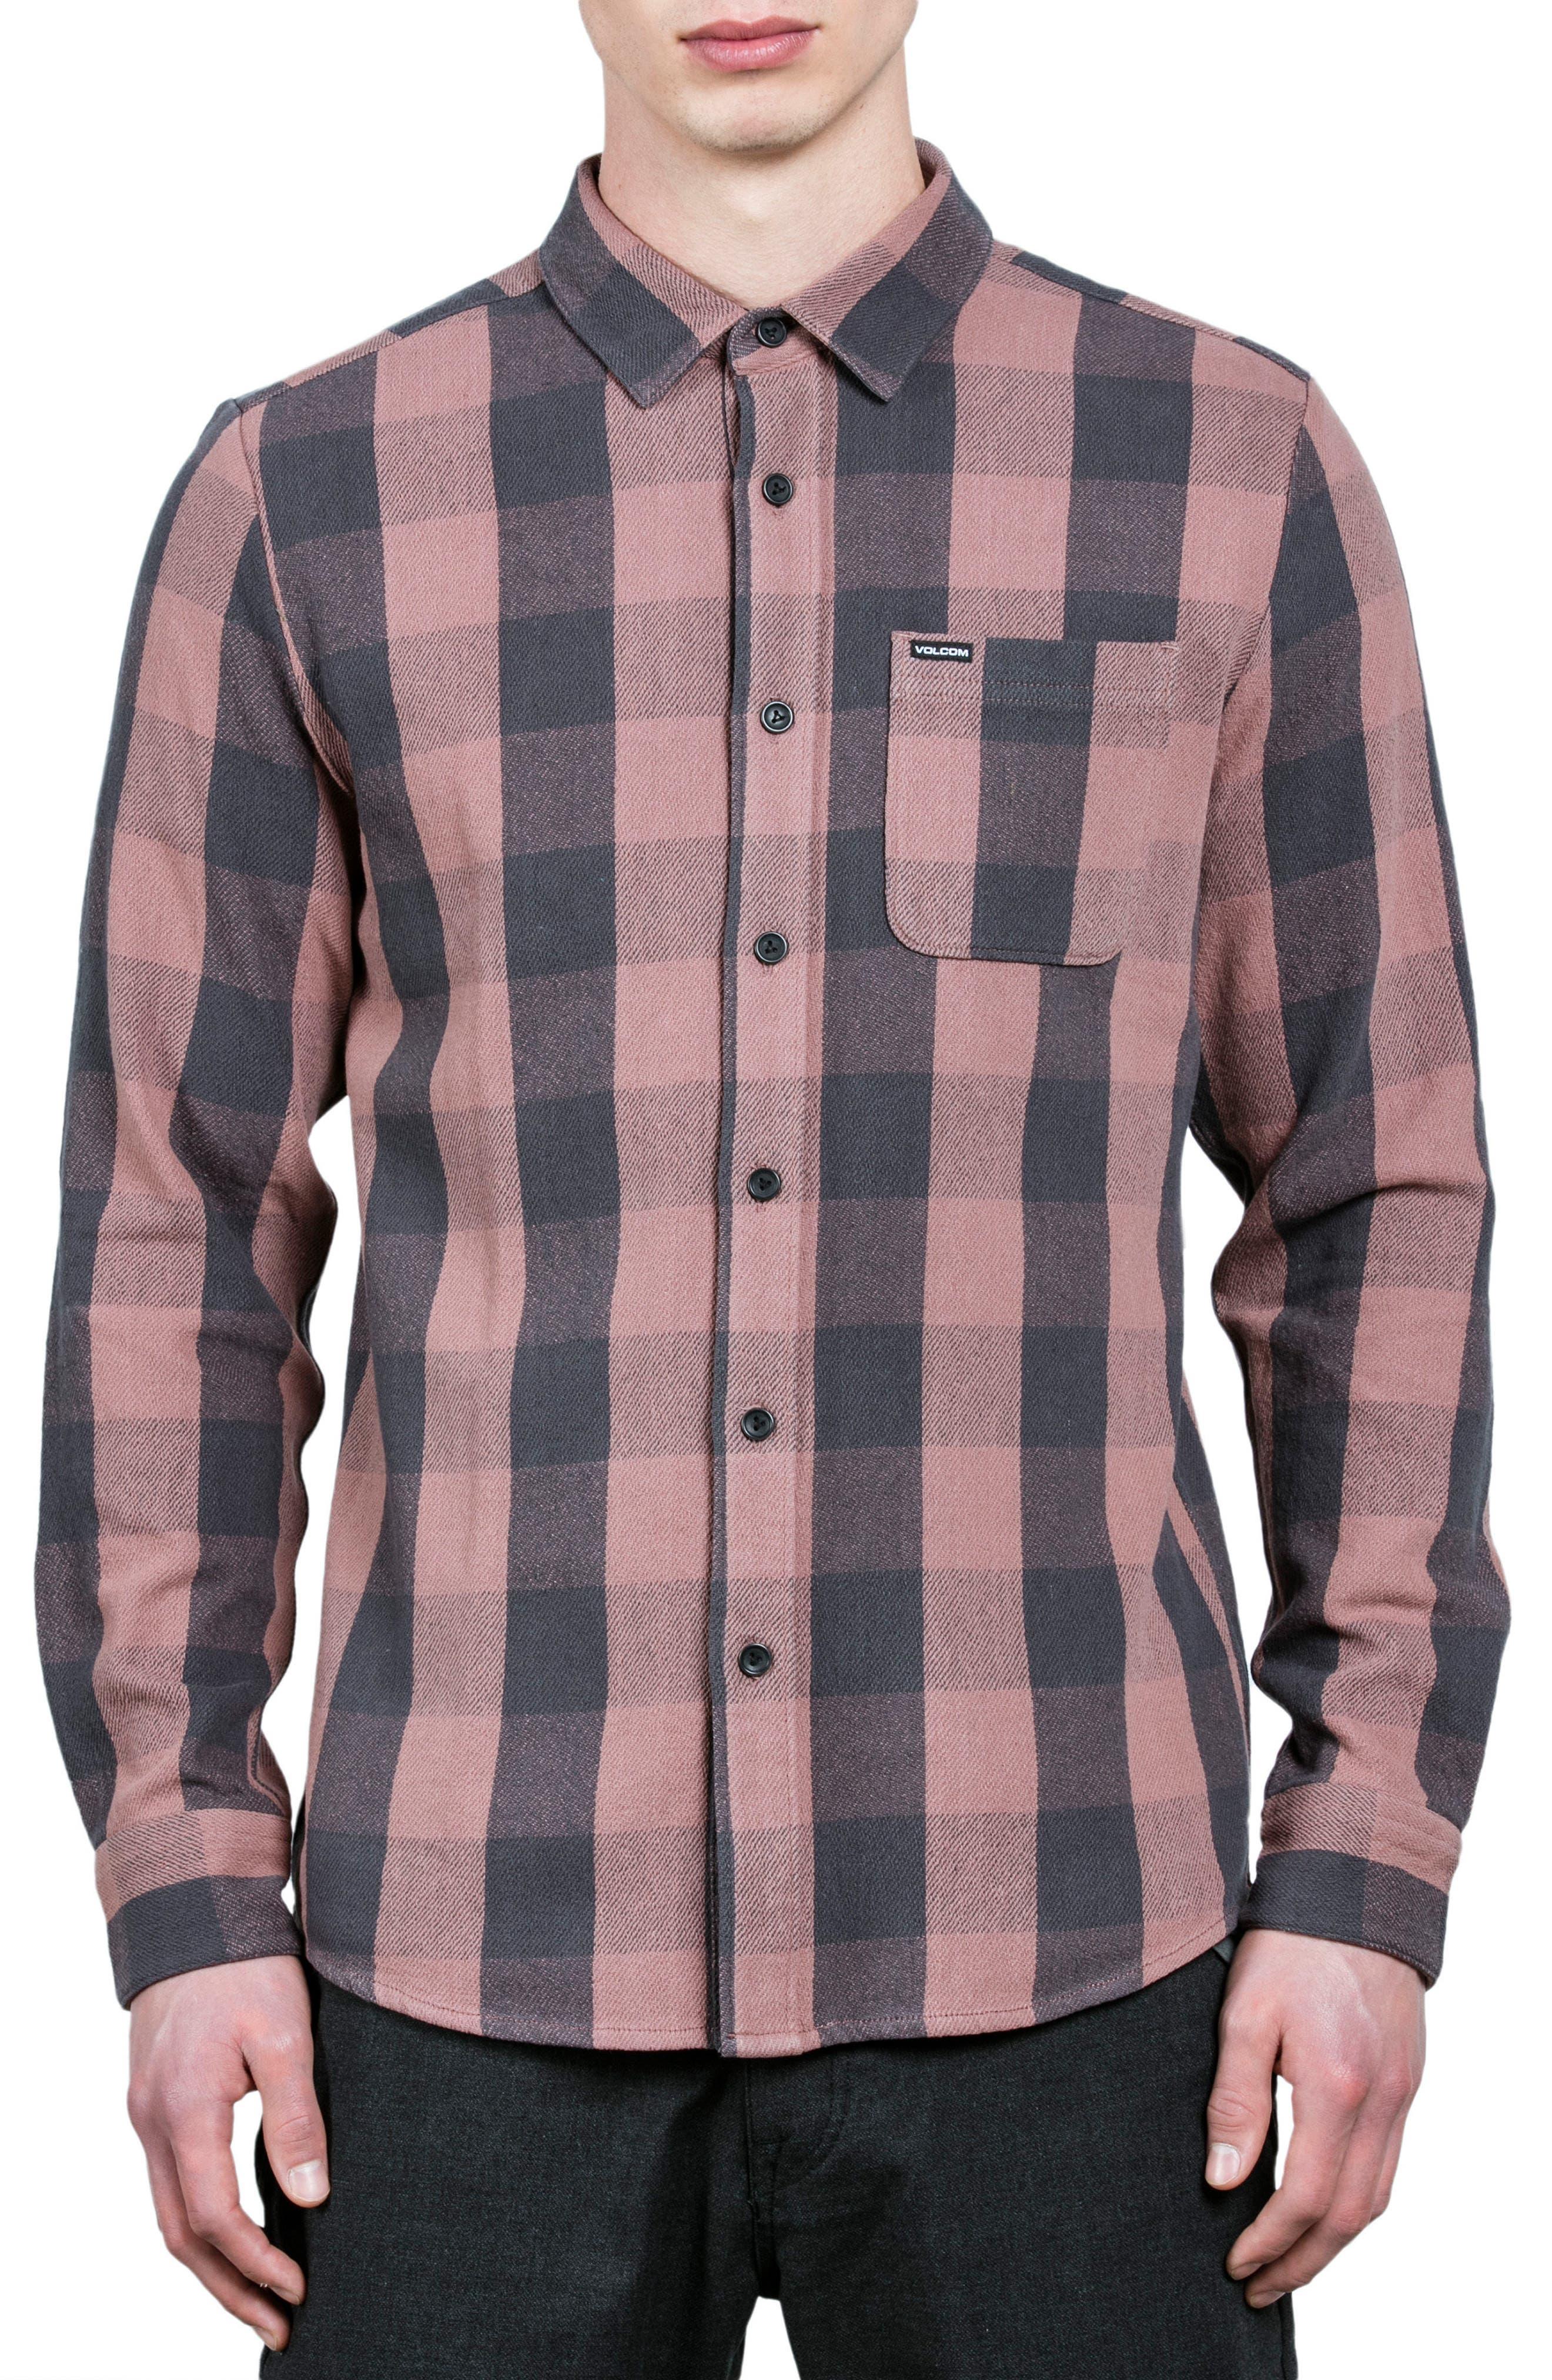 Main Image - Volcom Invert Check Flannel Shirt